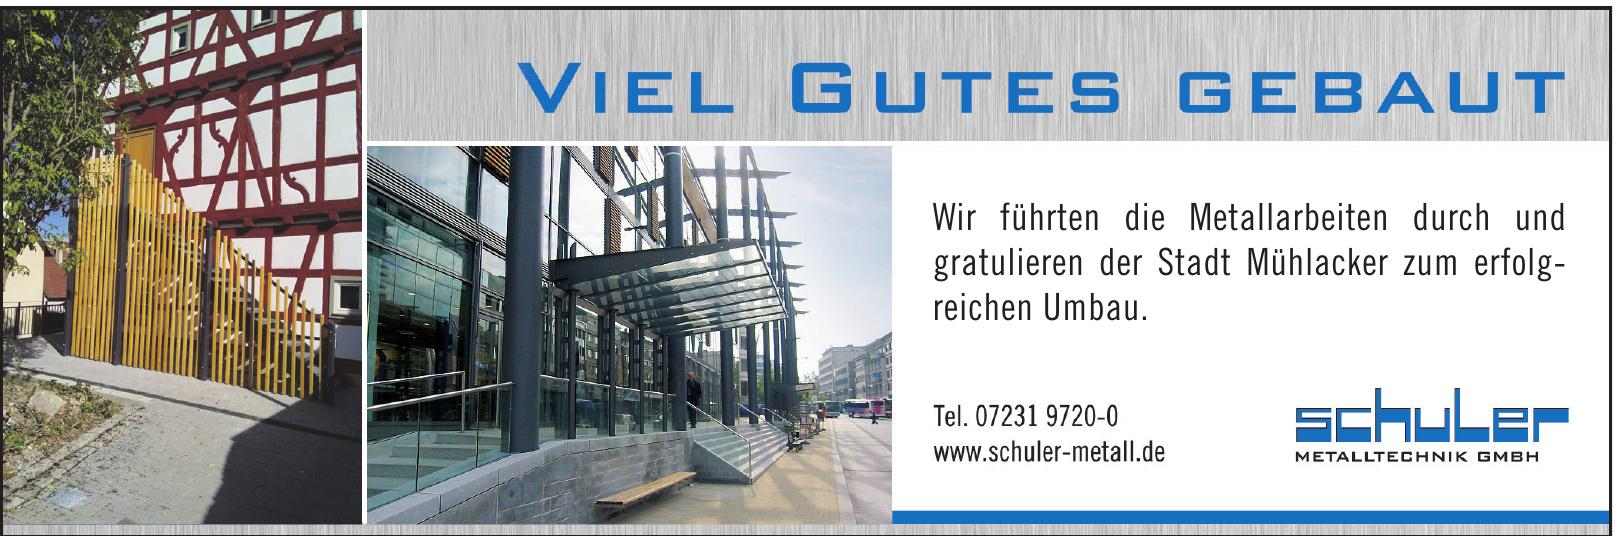 Schuler Metalltechnik GmbH